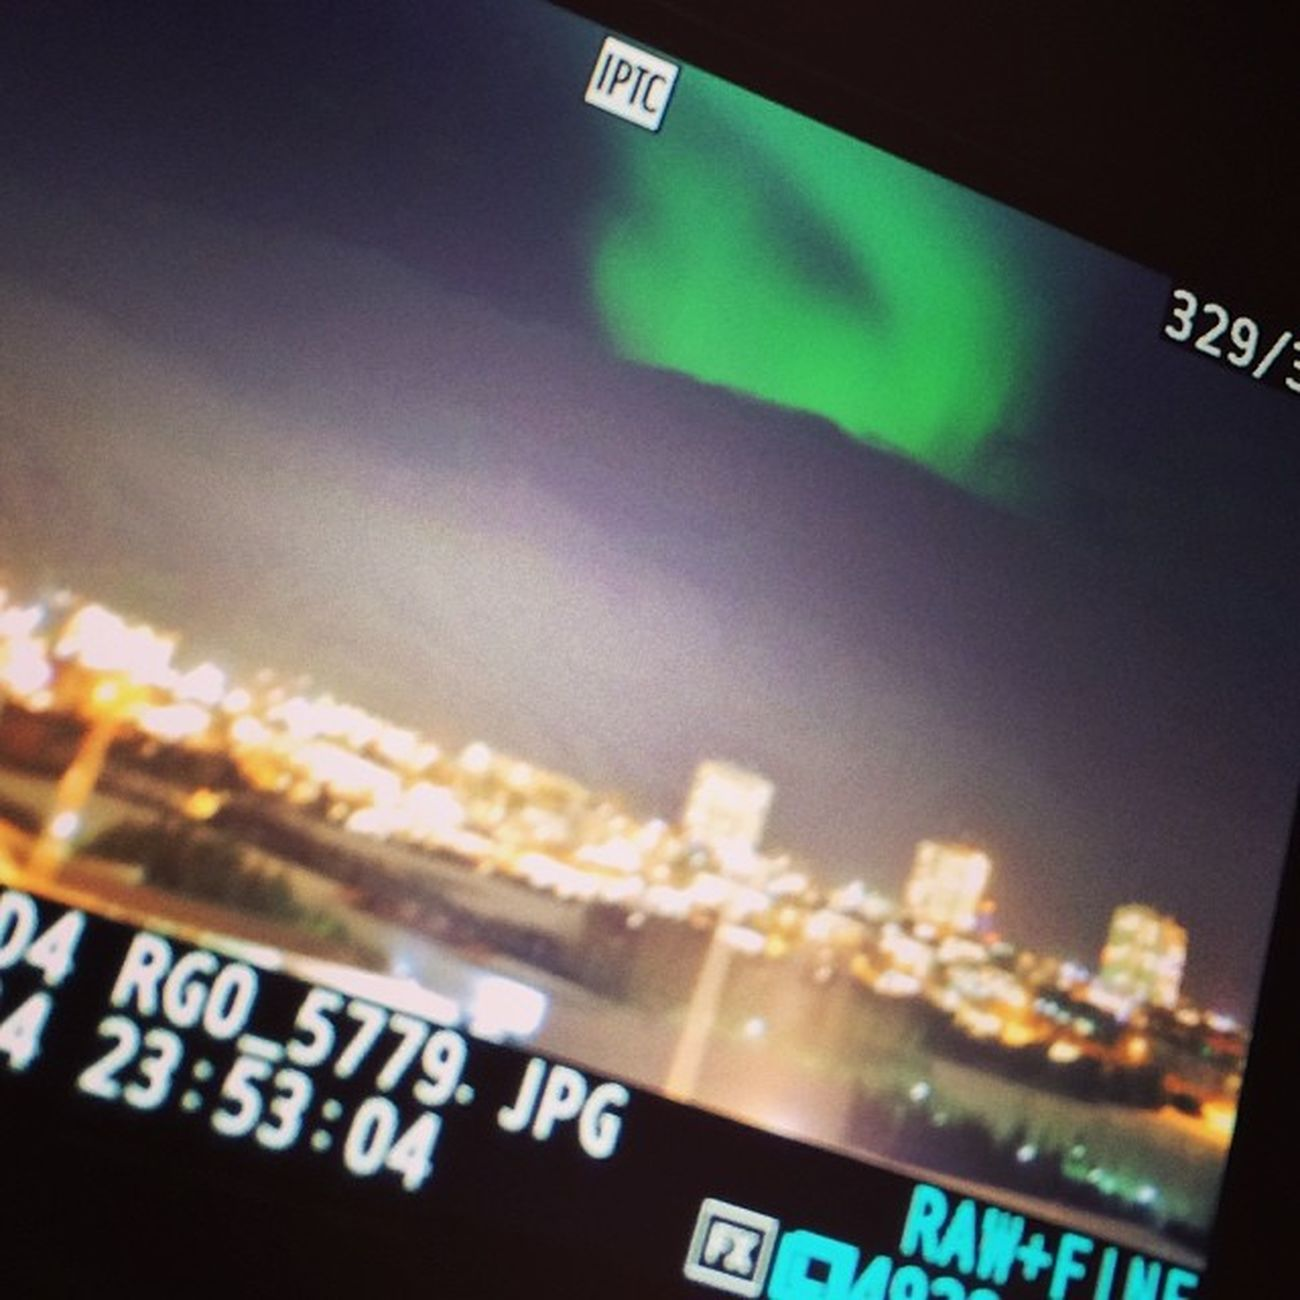 Yeah, northern lights! #iceland #reykjavik #lights #northern #nature #now Iceland 2013 Lights Reykjavik Nature Northern Beautiful NorthernLights Bestoficeland Winter Holiday Travel Nice Now Like Trip Island Photooftheday